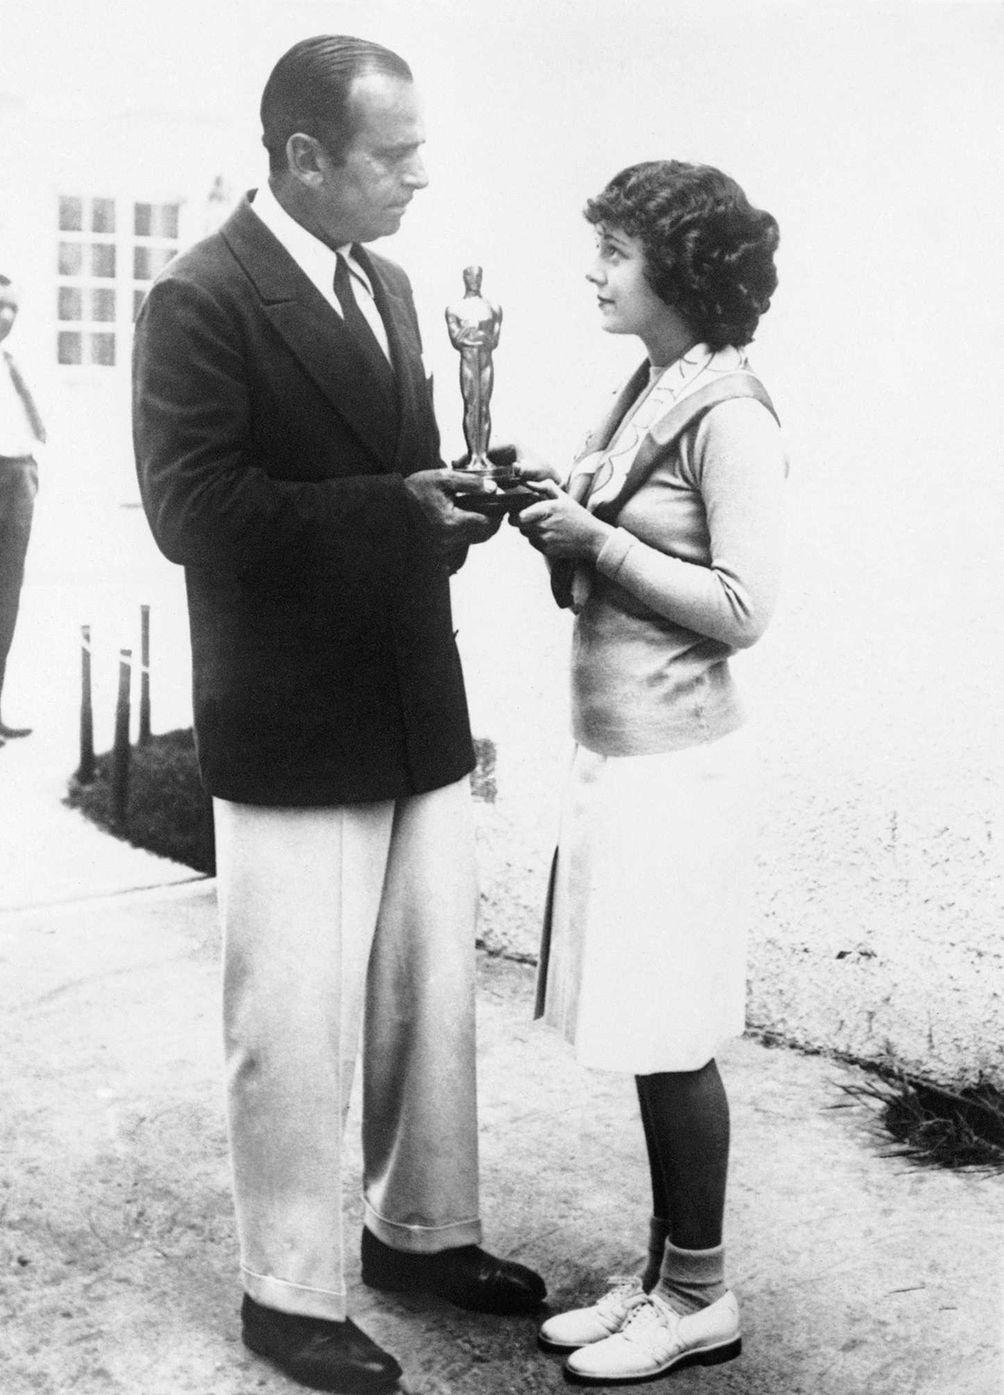 1927/28 - Janet Gaynor - 7th Heaven Janet